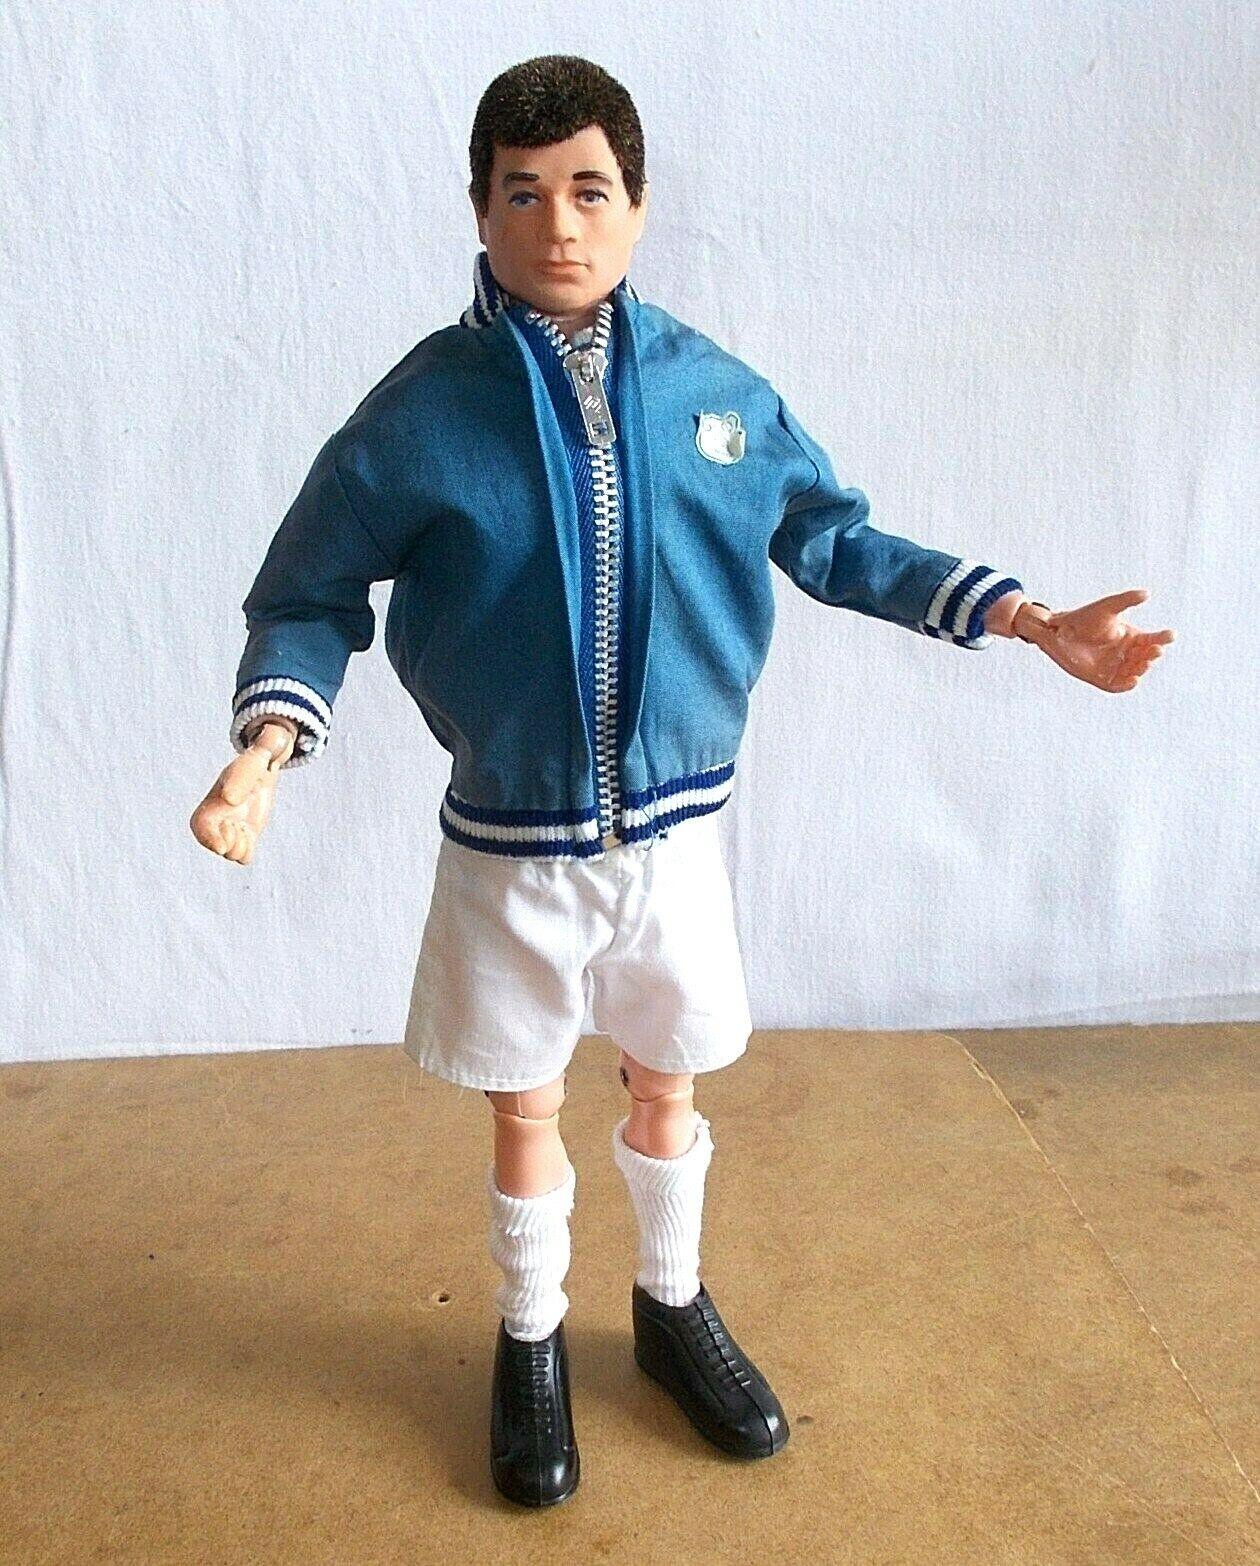 Vintage palitoy ACTION MAN vam - EGrünON FC FOOTBALLER - 70's